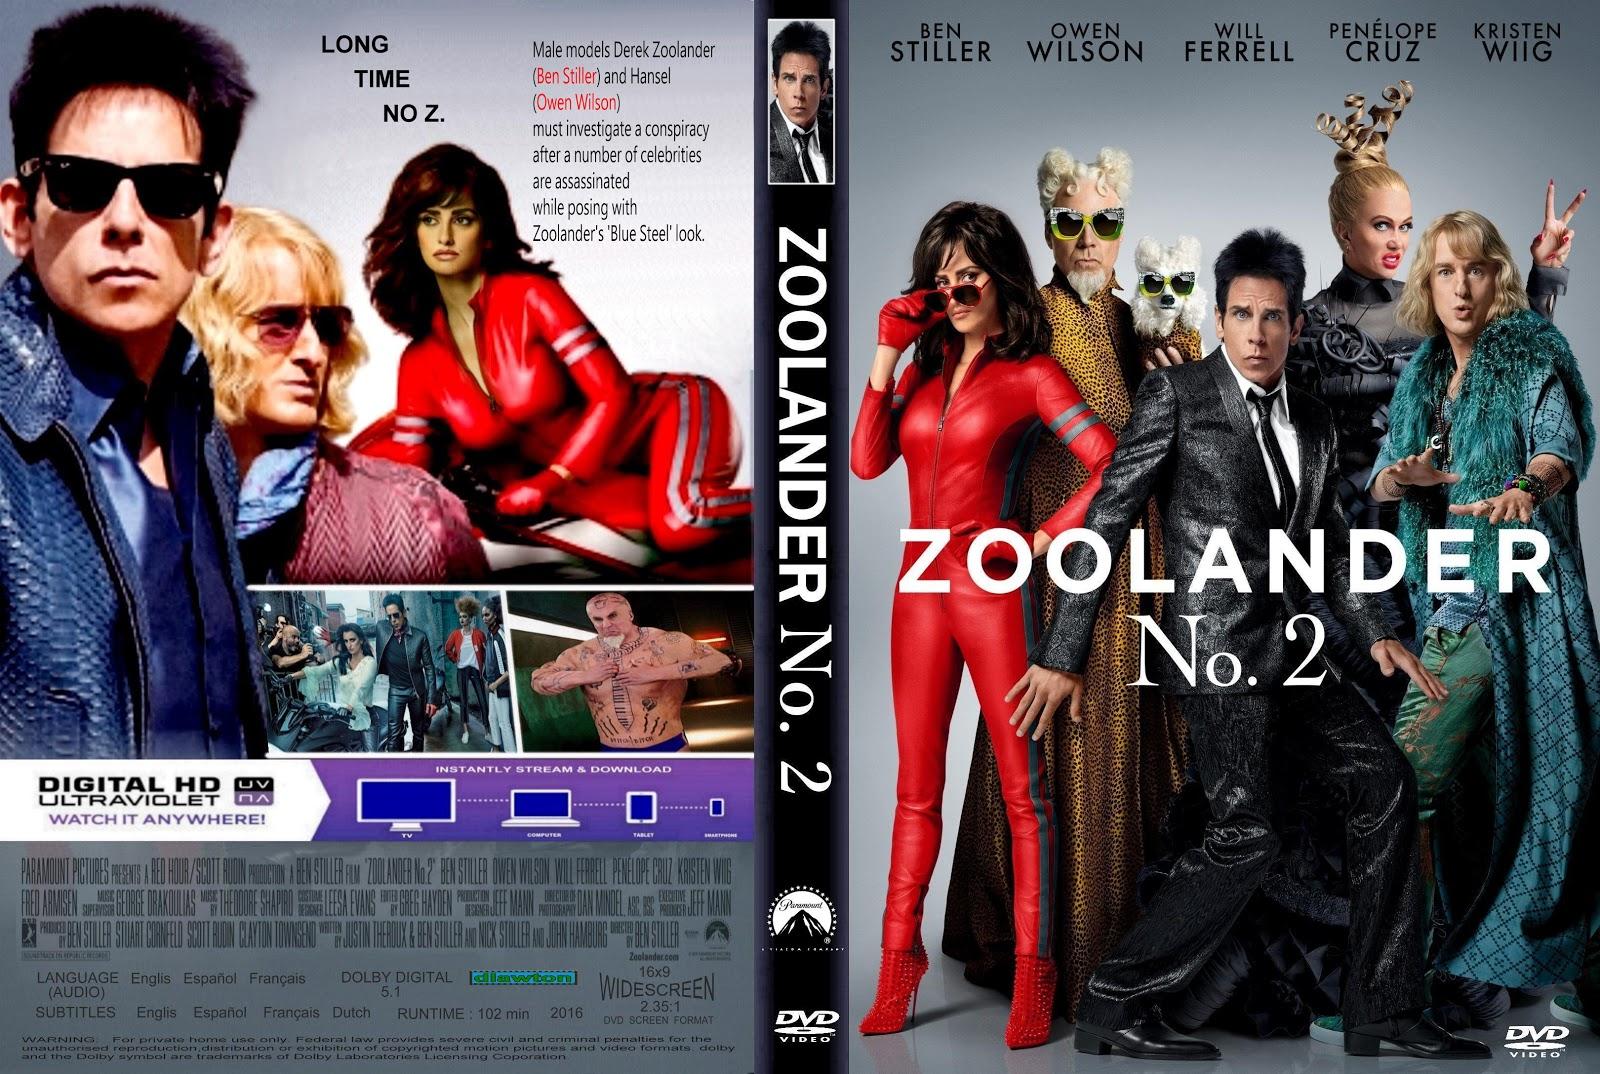 Download Zoolander 2 DVD-R Zoolander 2B2 2B 25282016 2529 2B 25281 2529